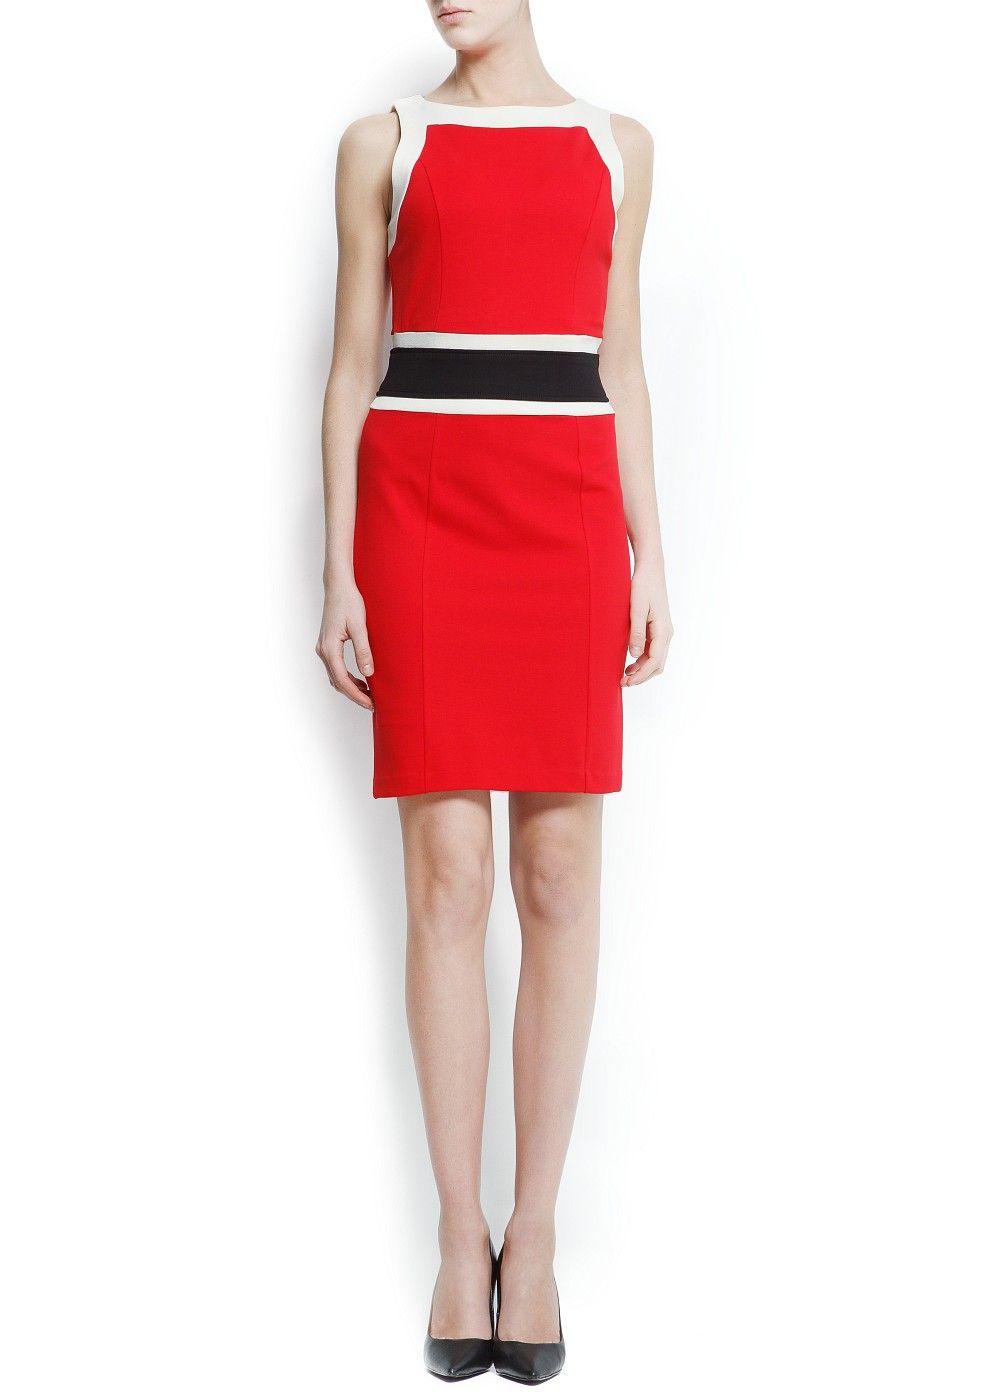 MANGO - PRENDAS - Vestidos - Vestido bloques color 5f0d203e7175